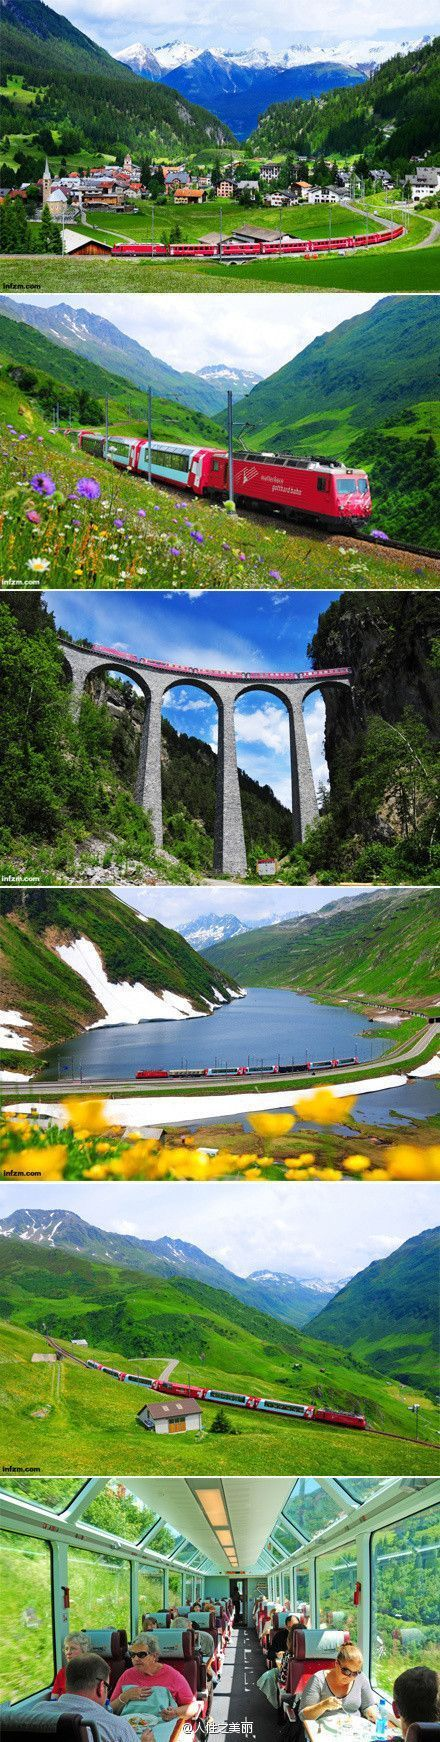 Switzerland express train - Glacier Express between St. Moritz and Zermatt. Sounds wonderful! More